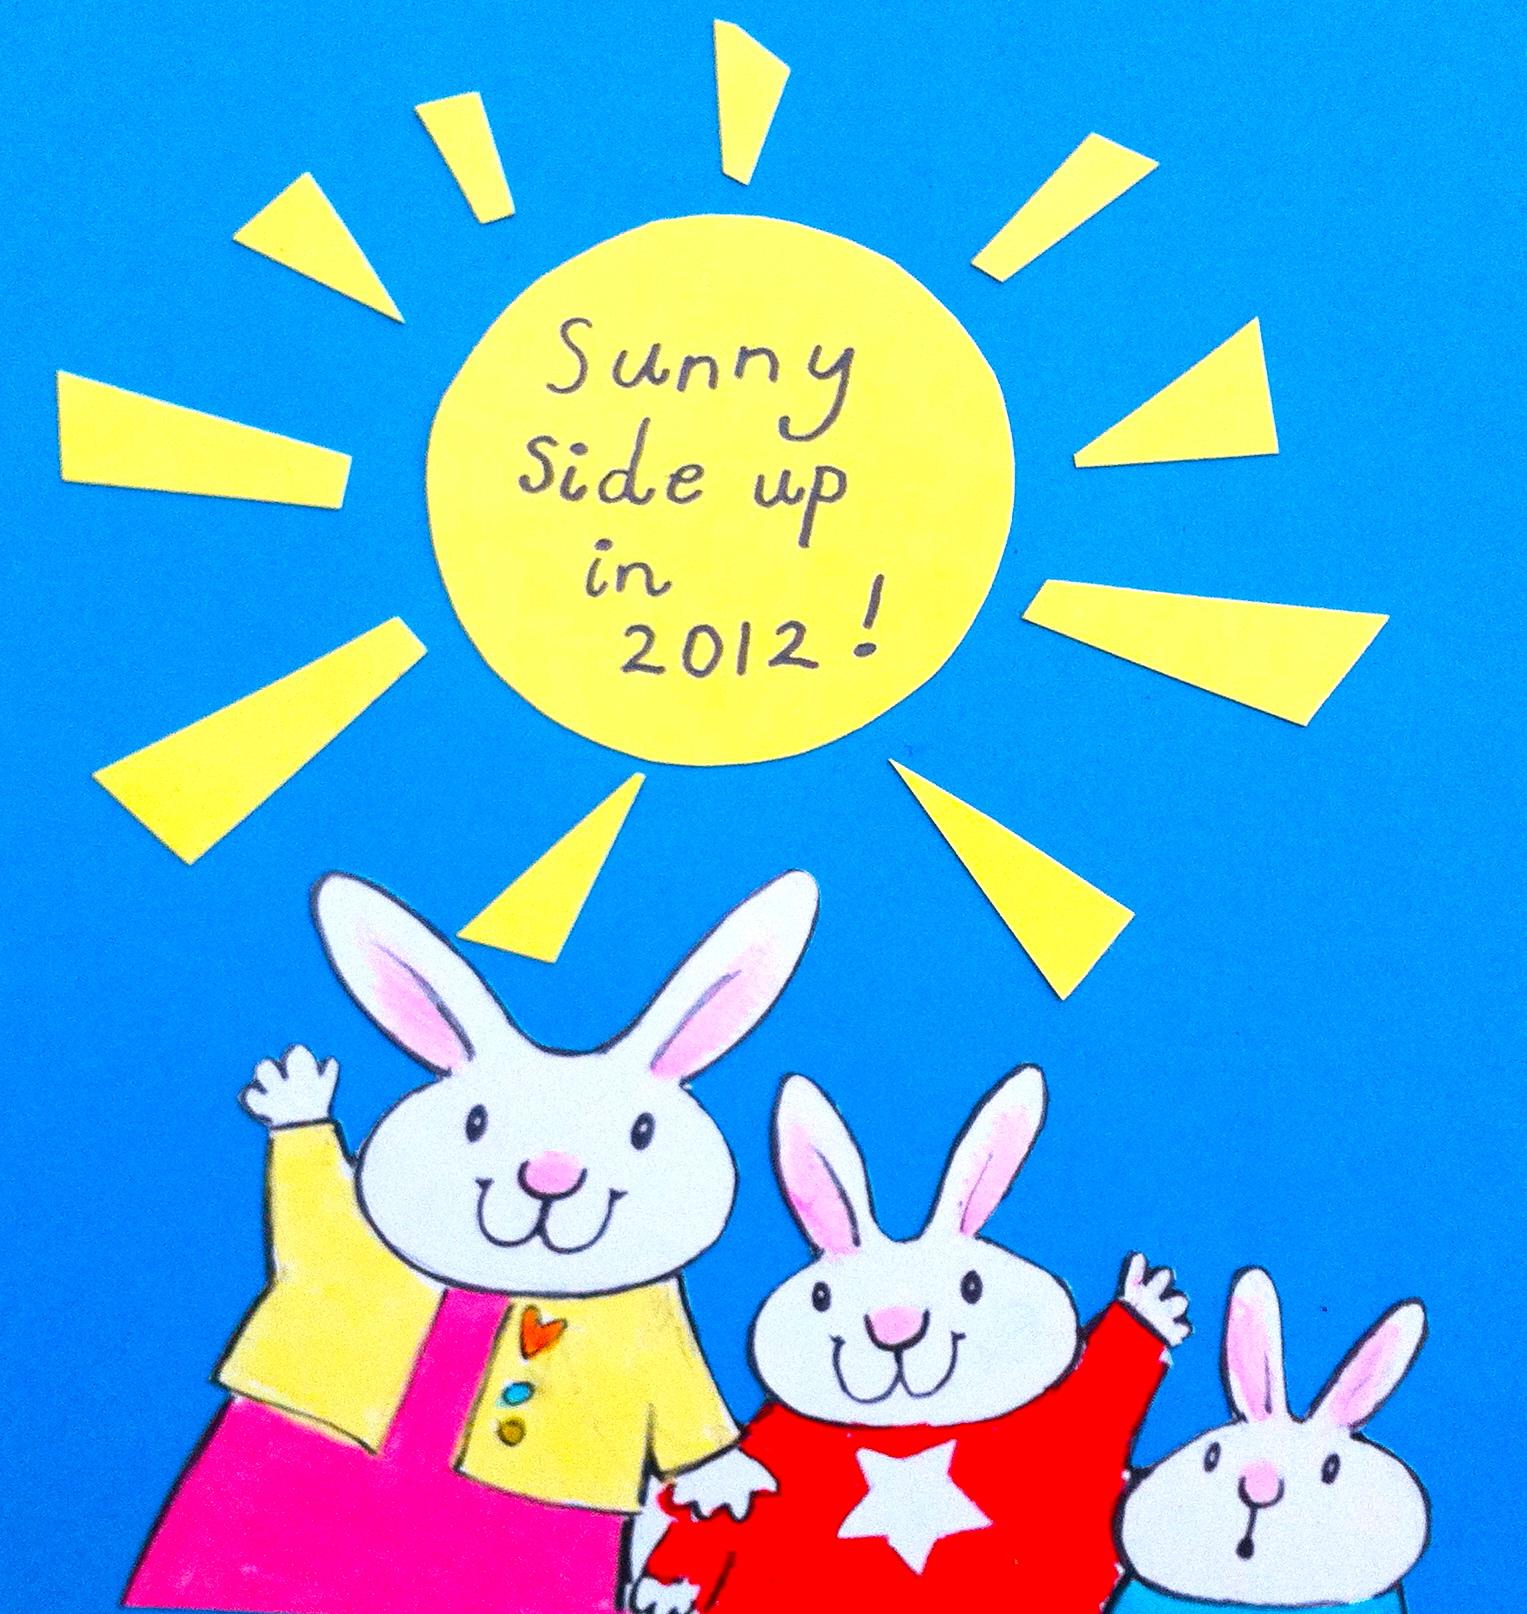 bunny new year, everybody!